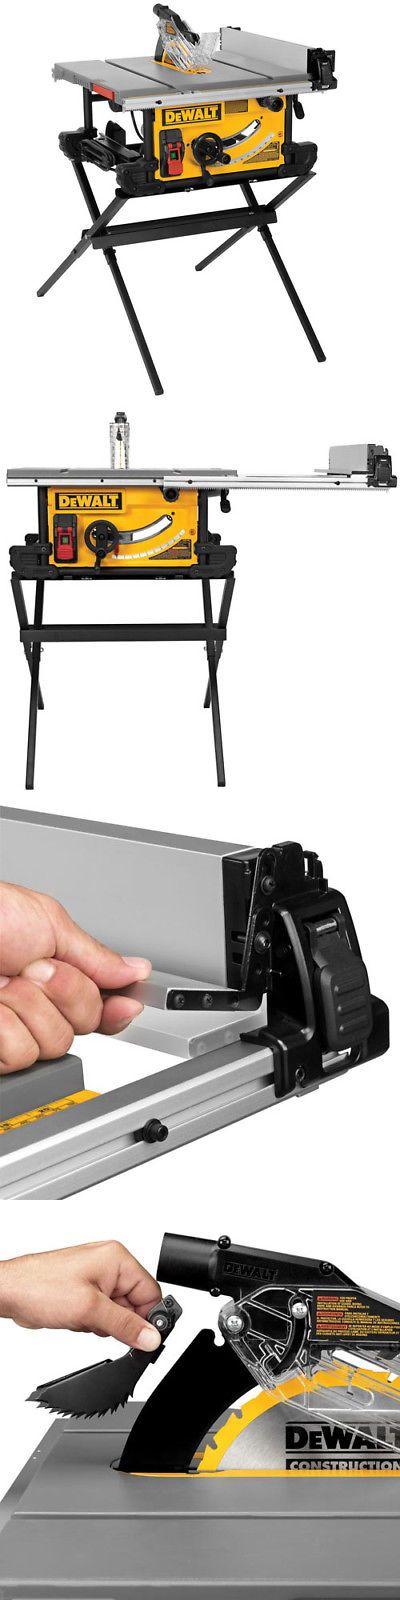 Table Saws 122835: Dewalt 10 Compact Table Saw W Scissor Stand Dwe7490x New -> BUY IT NOW ONLY: $499 on eBay!